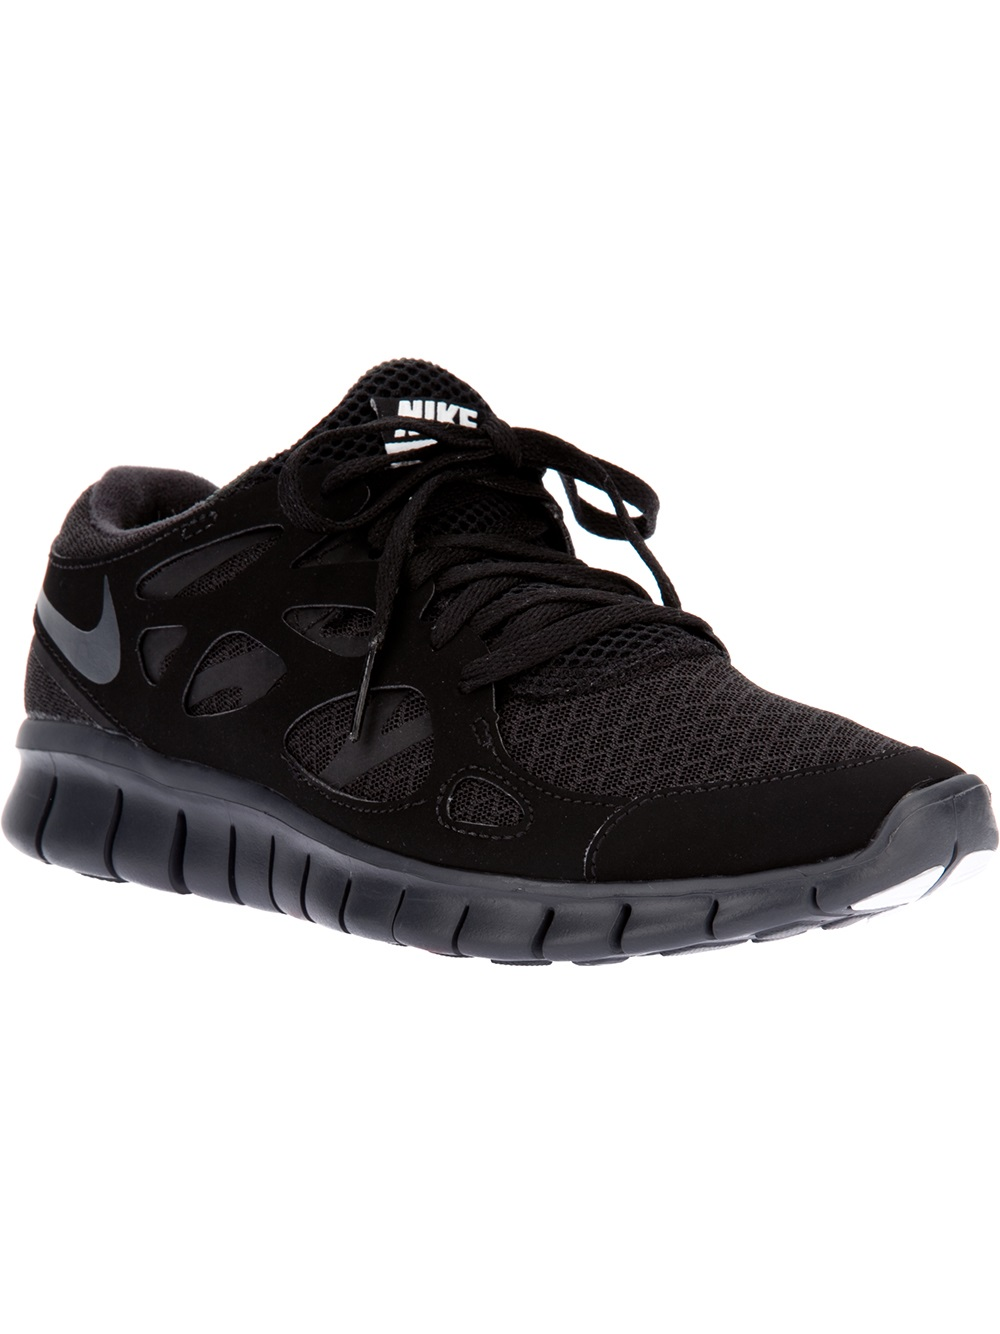 wholesale dealer 7435f 18ed8 Nike Free Run 2 Nsw Trainer in Black for Men - Lyst